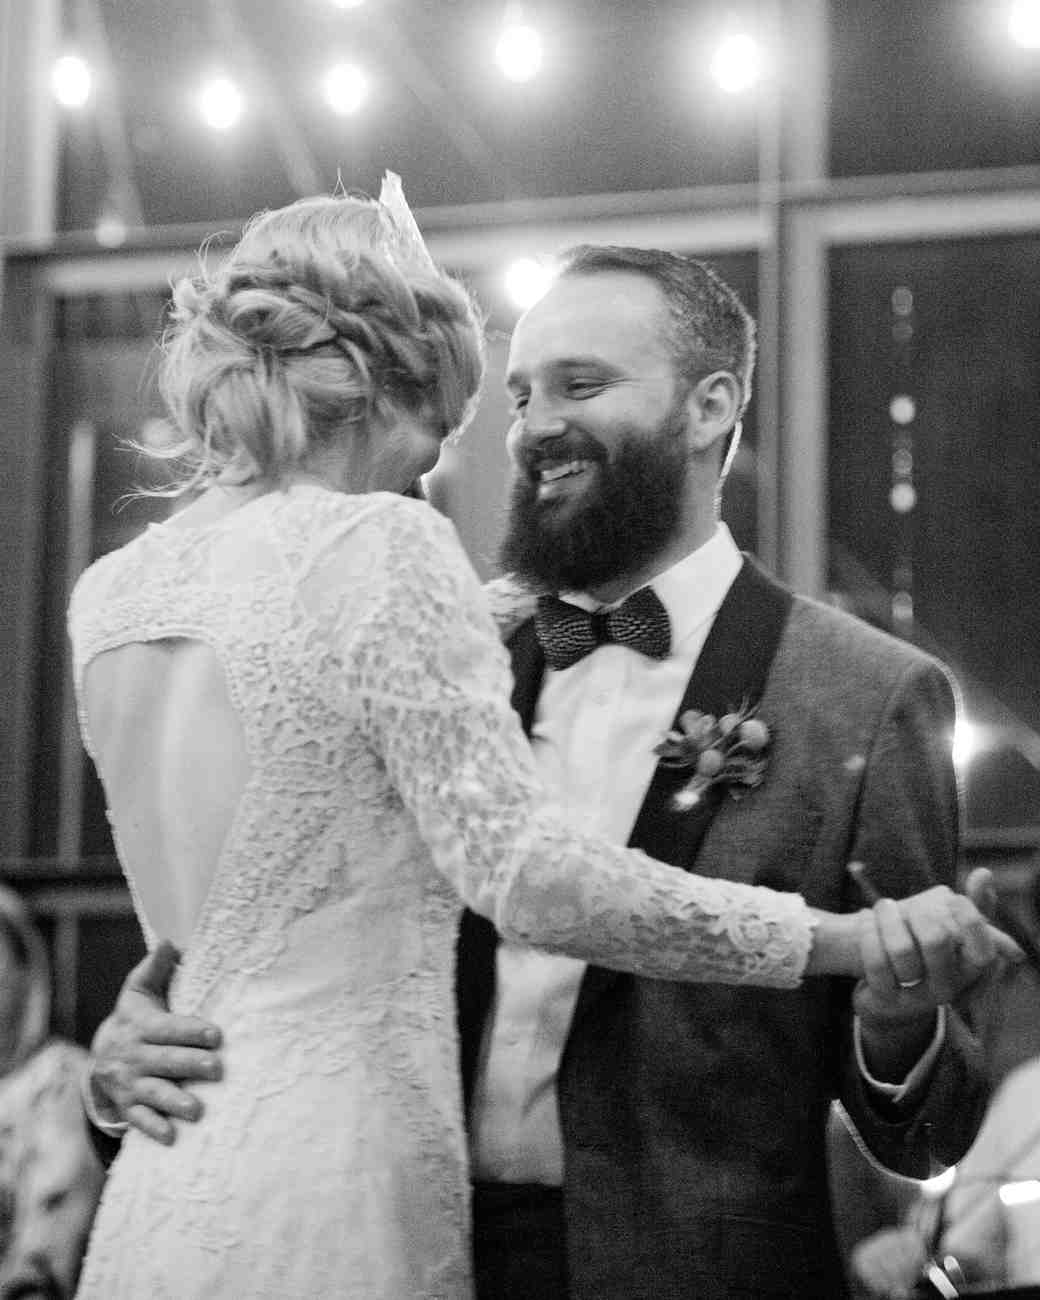 abby-chris-wedding-texas-firstdance-0671-s112832-0516.jpg